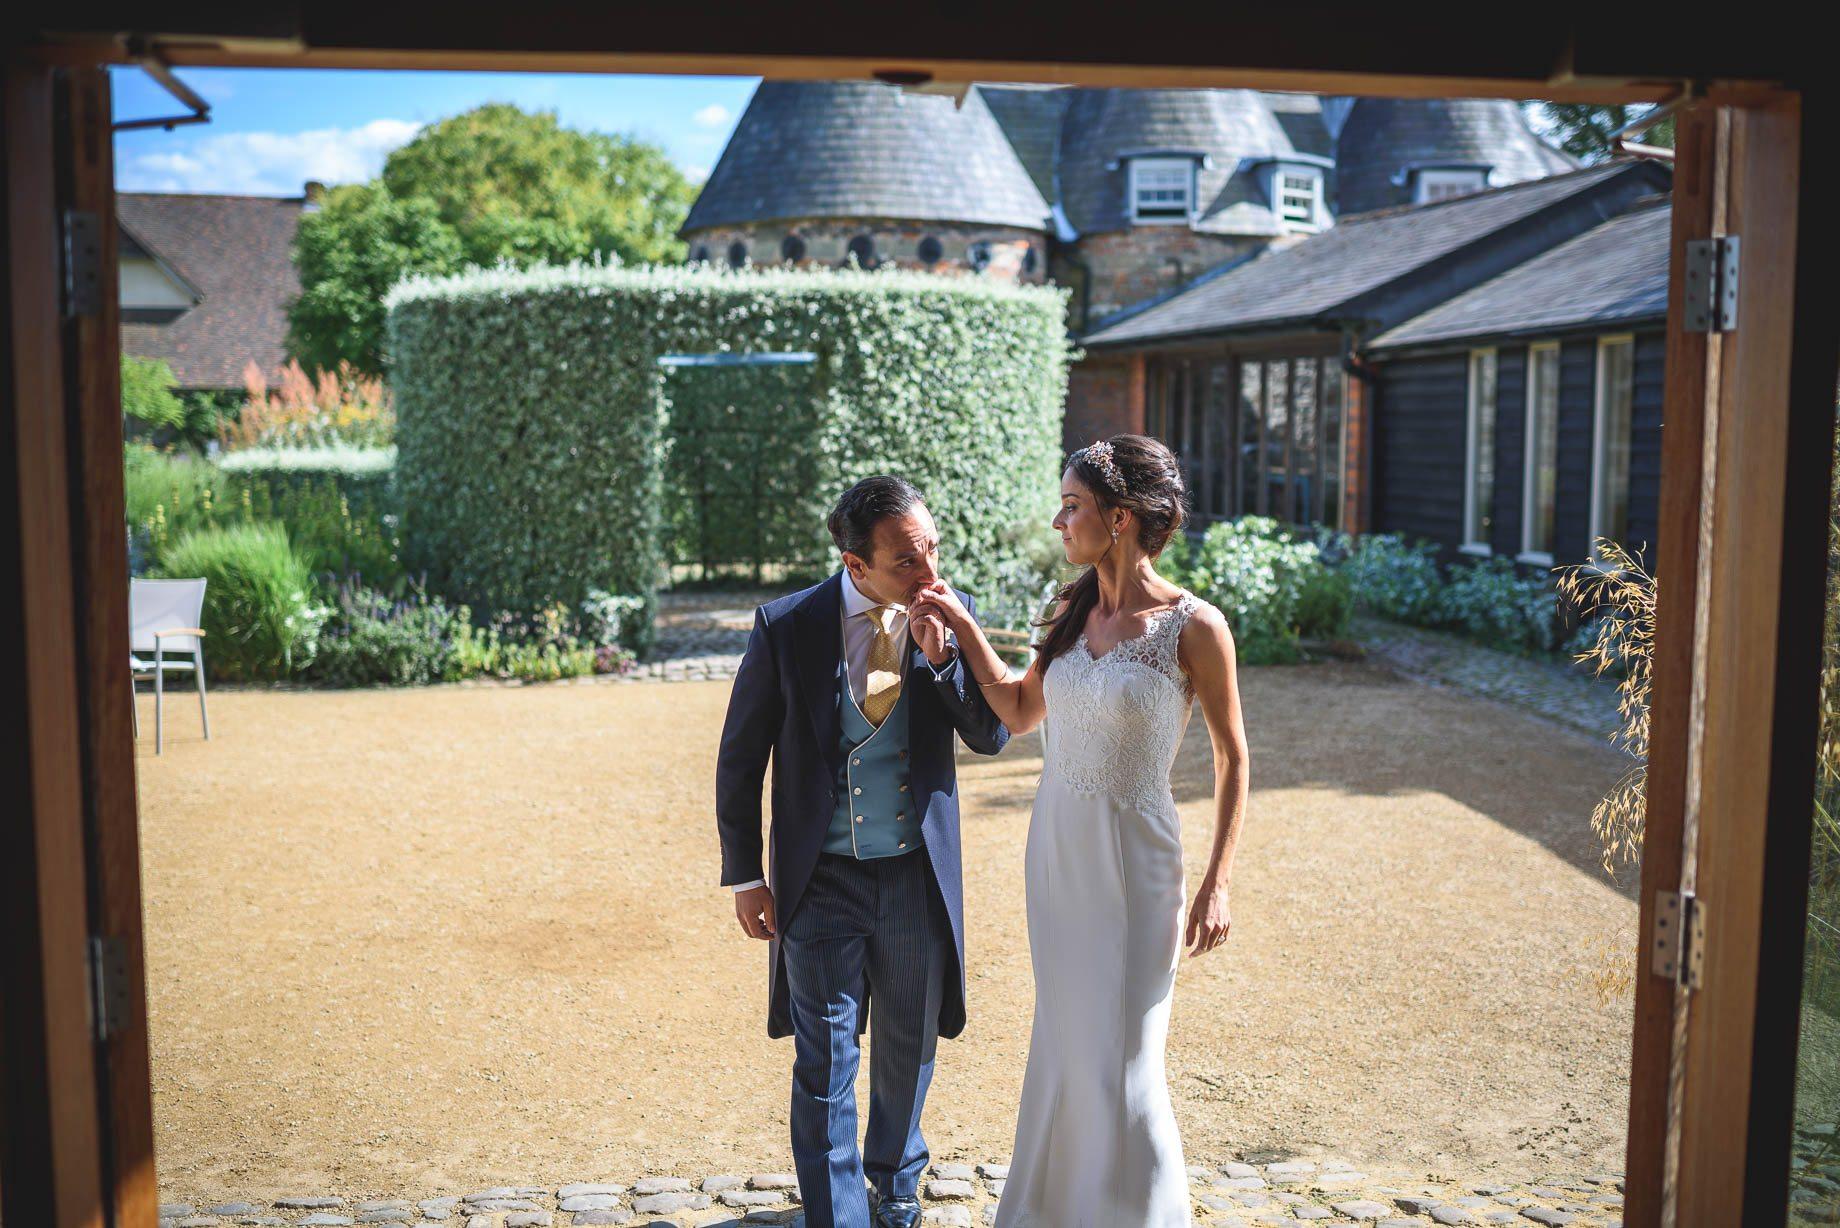 Bury Court Barn Wedding Photography - Caroline and Rob (122 of 219)